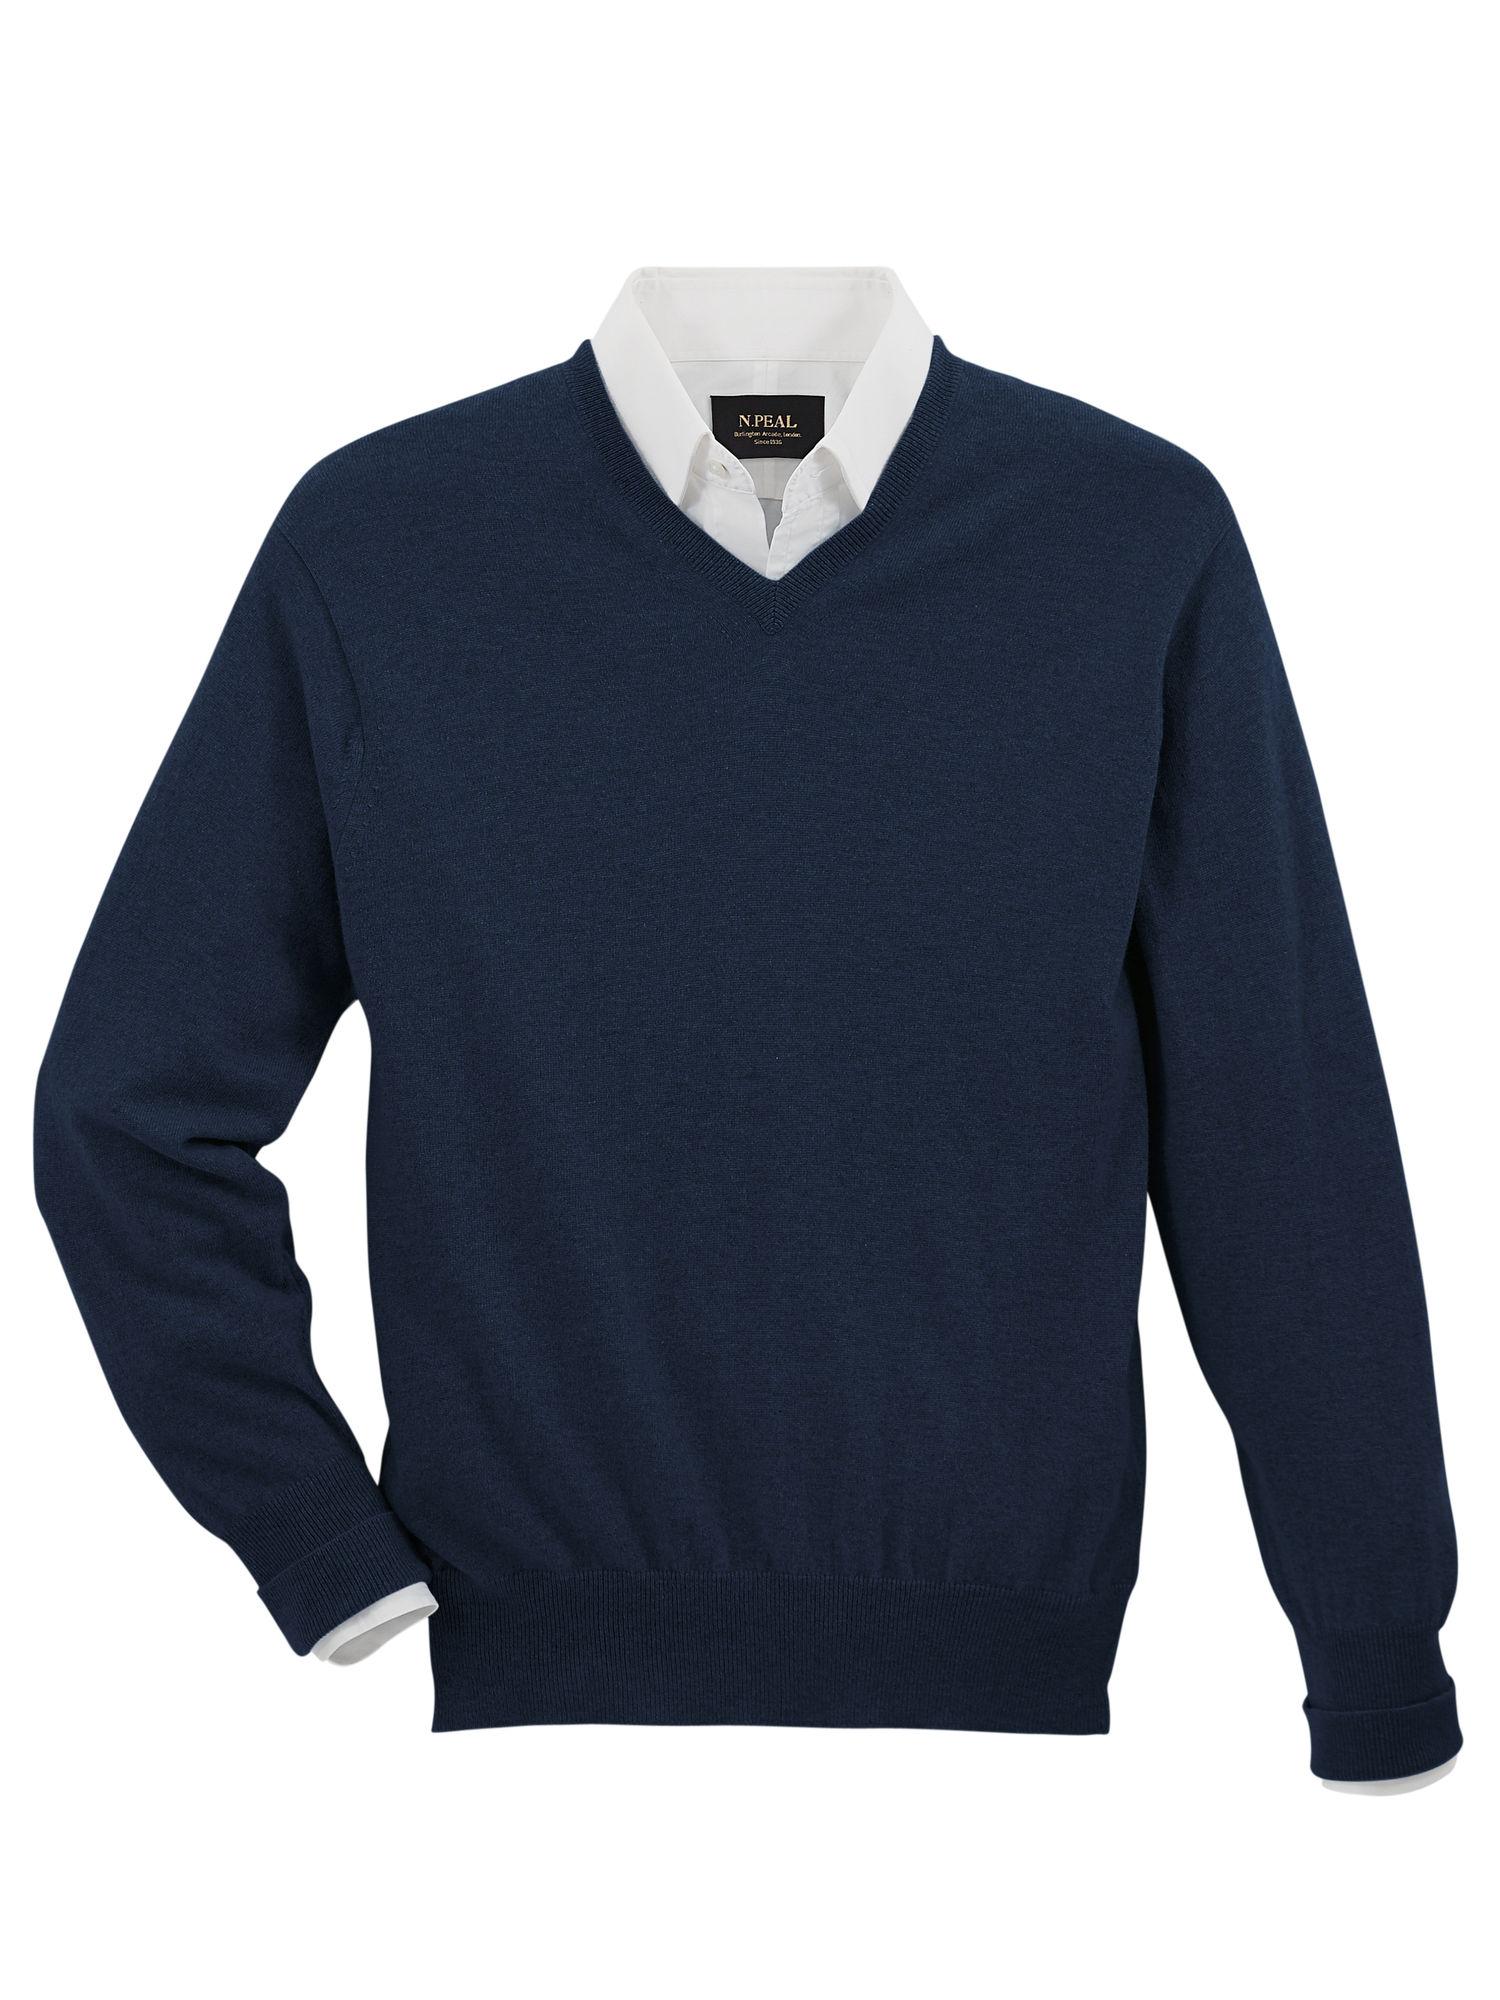 c03cfb8d8cd0 Pánský svetr